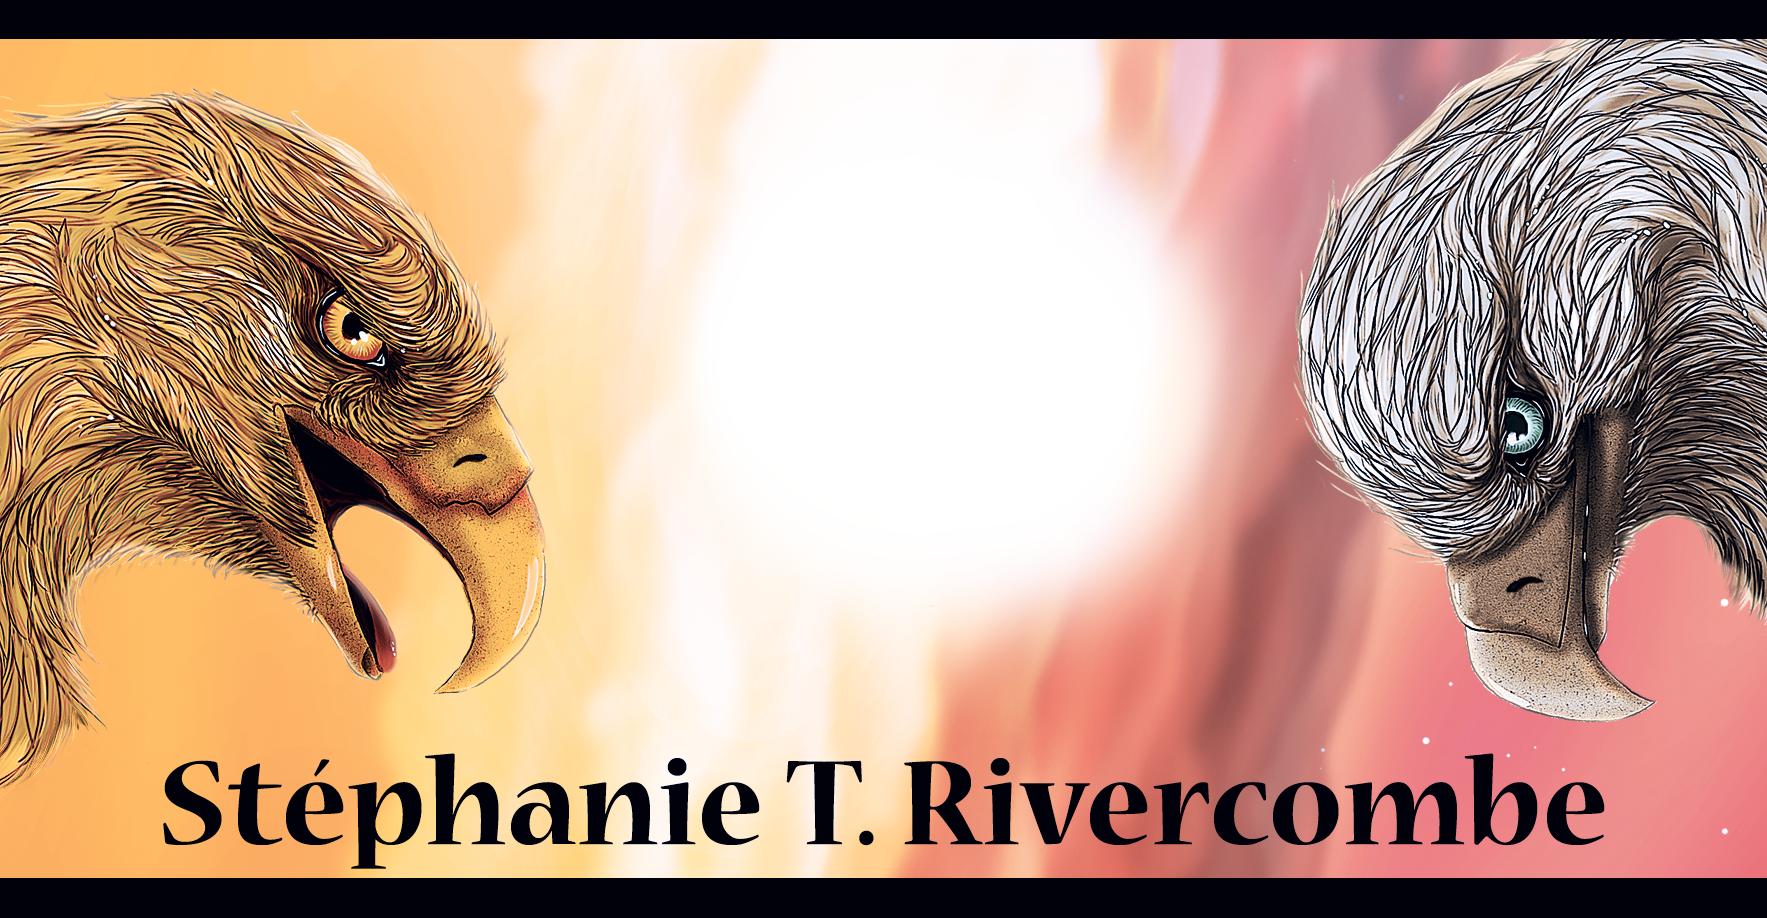 Stéphanie Rivercombe